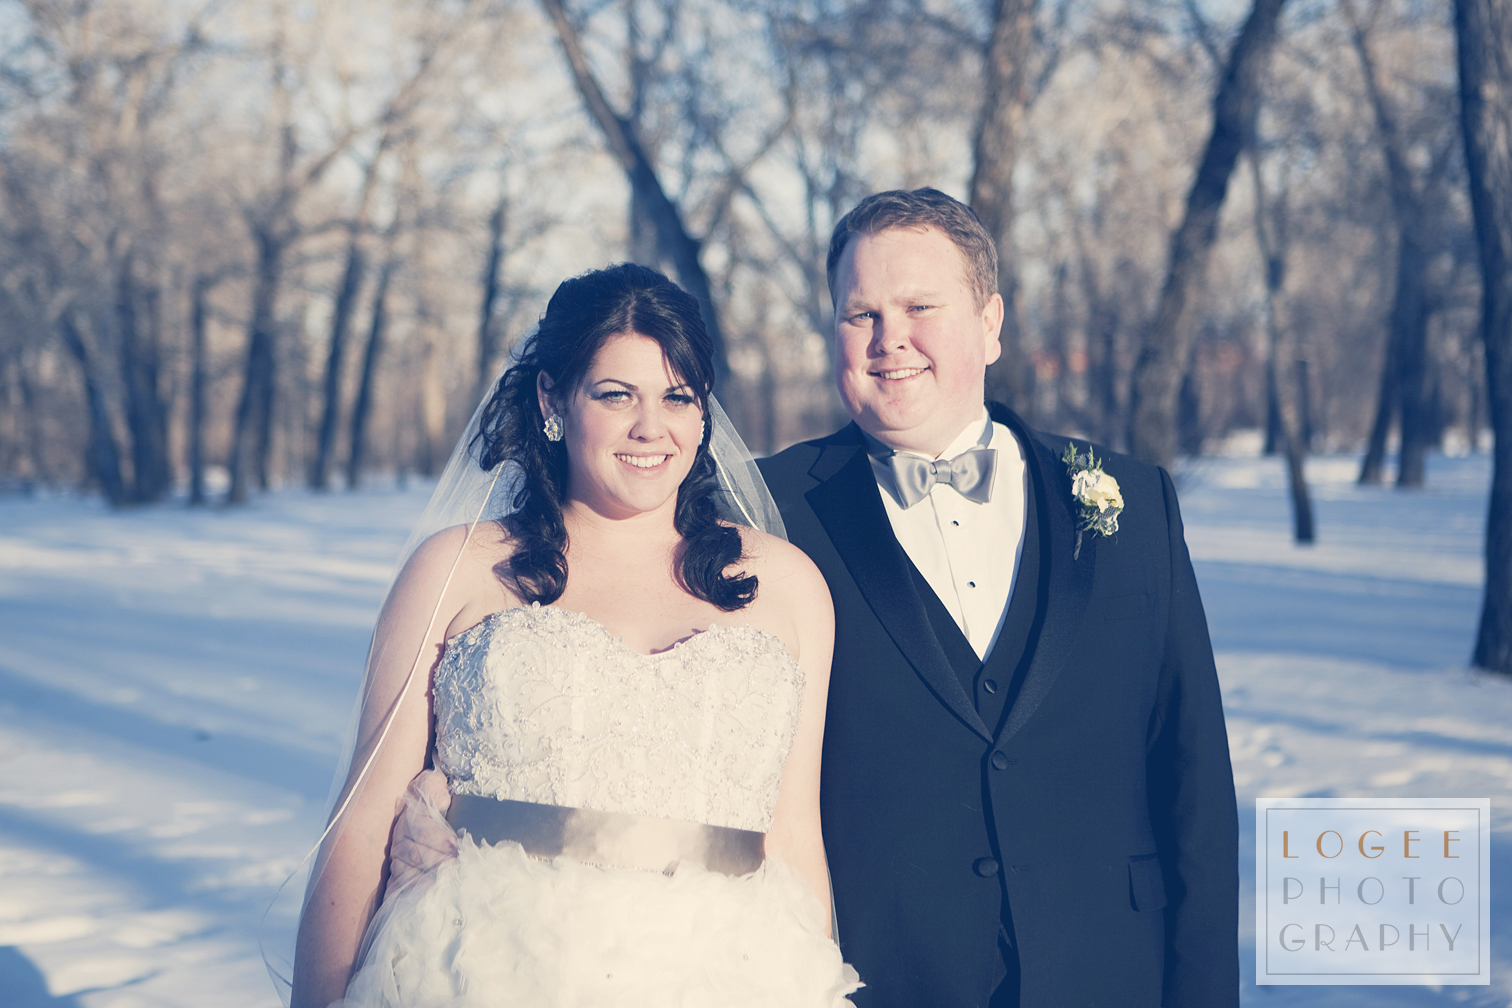 McIntosh-Burns Wedding - 6855Cw